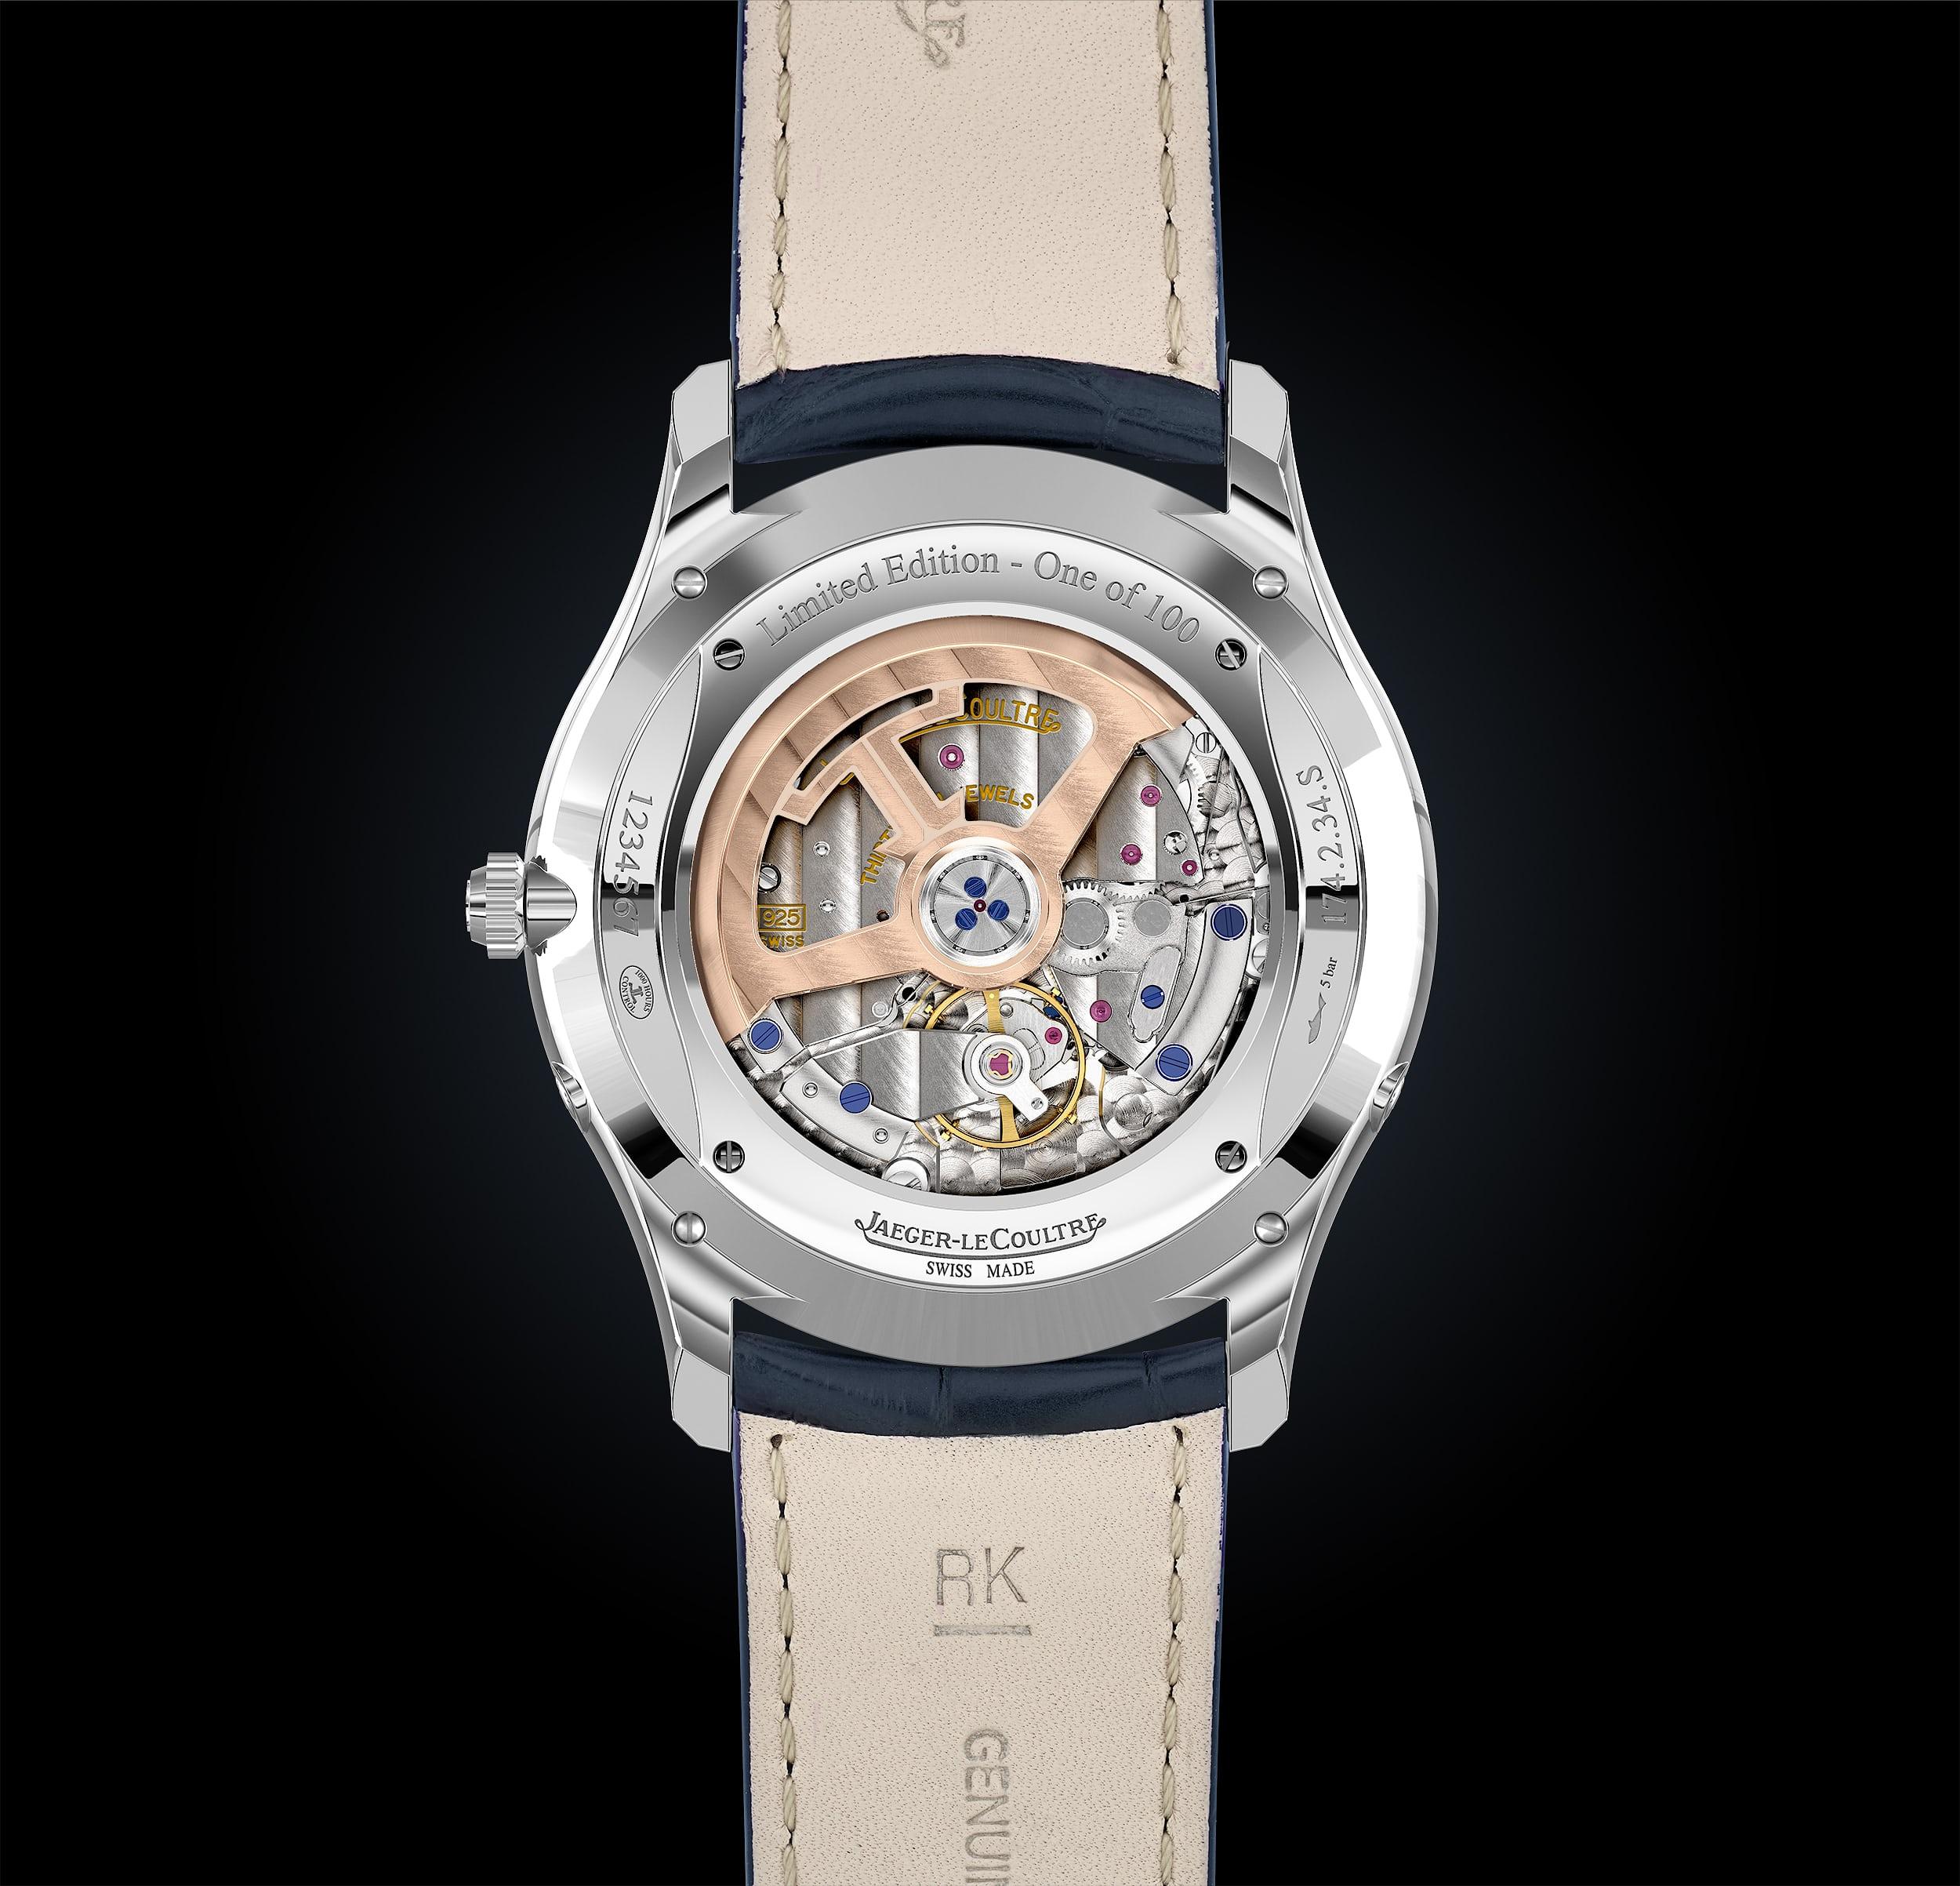 jaeger-lecoultre-master-ultra-thin-moon-ename-calibre-925/2